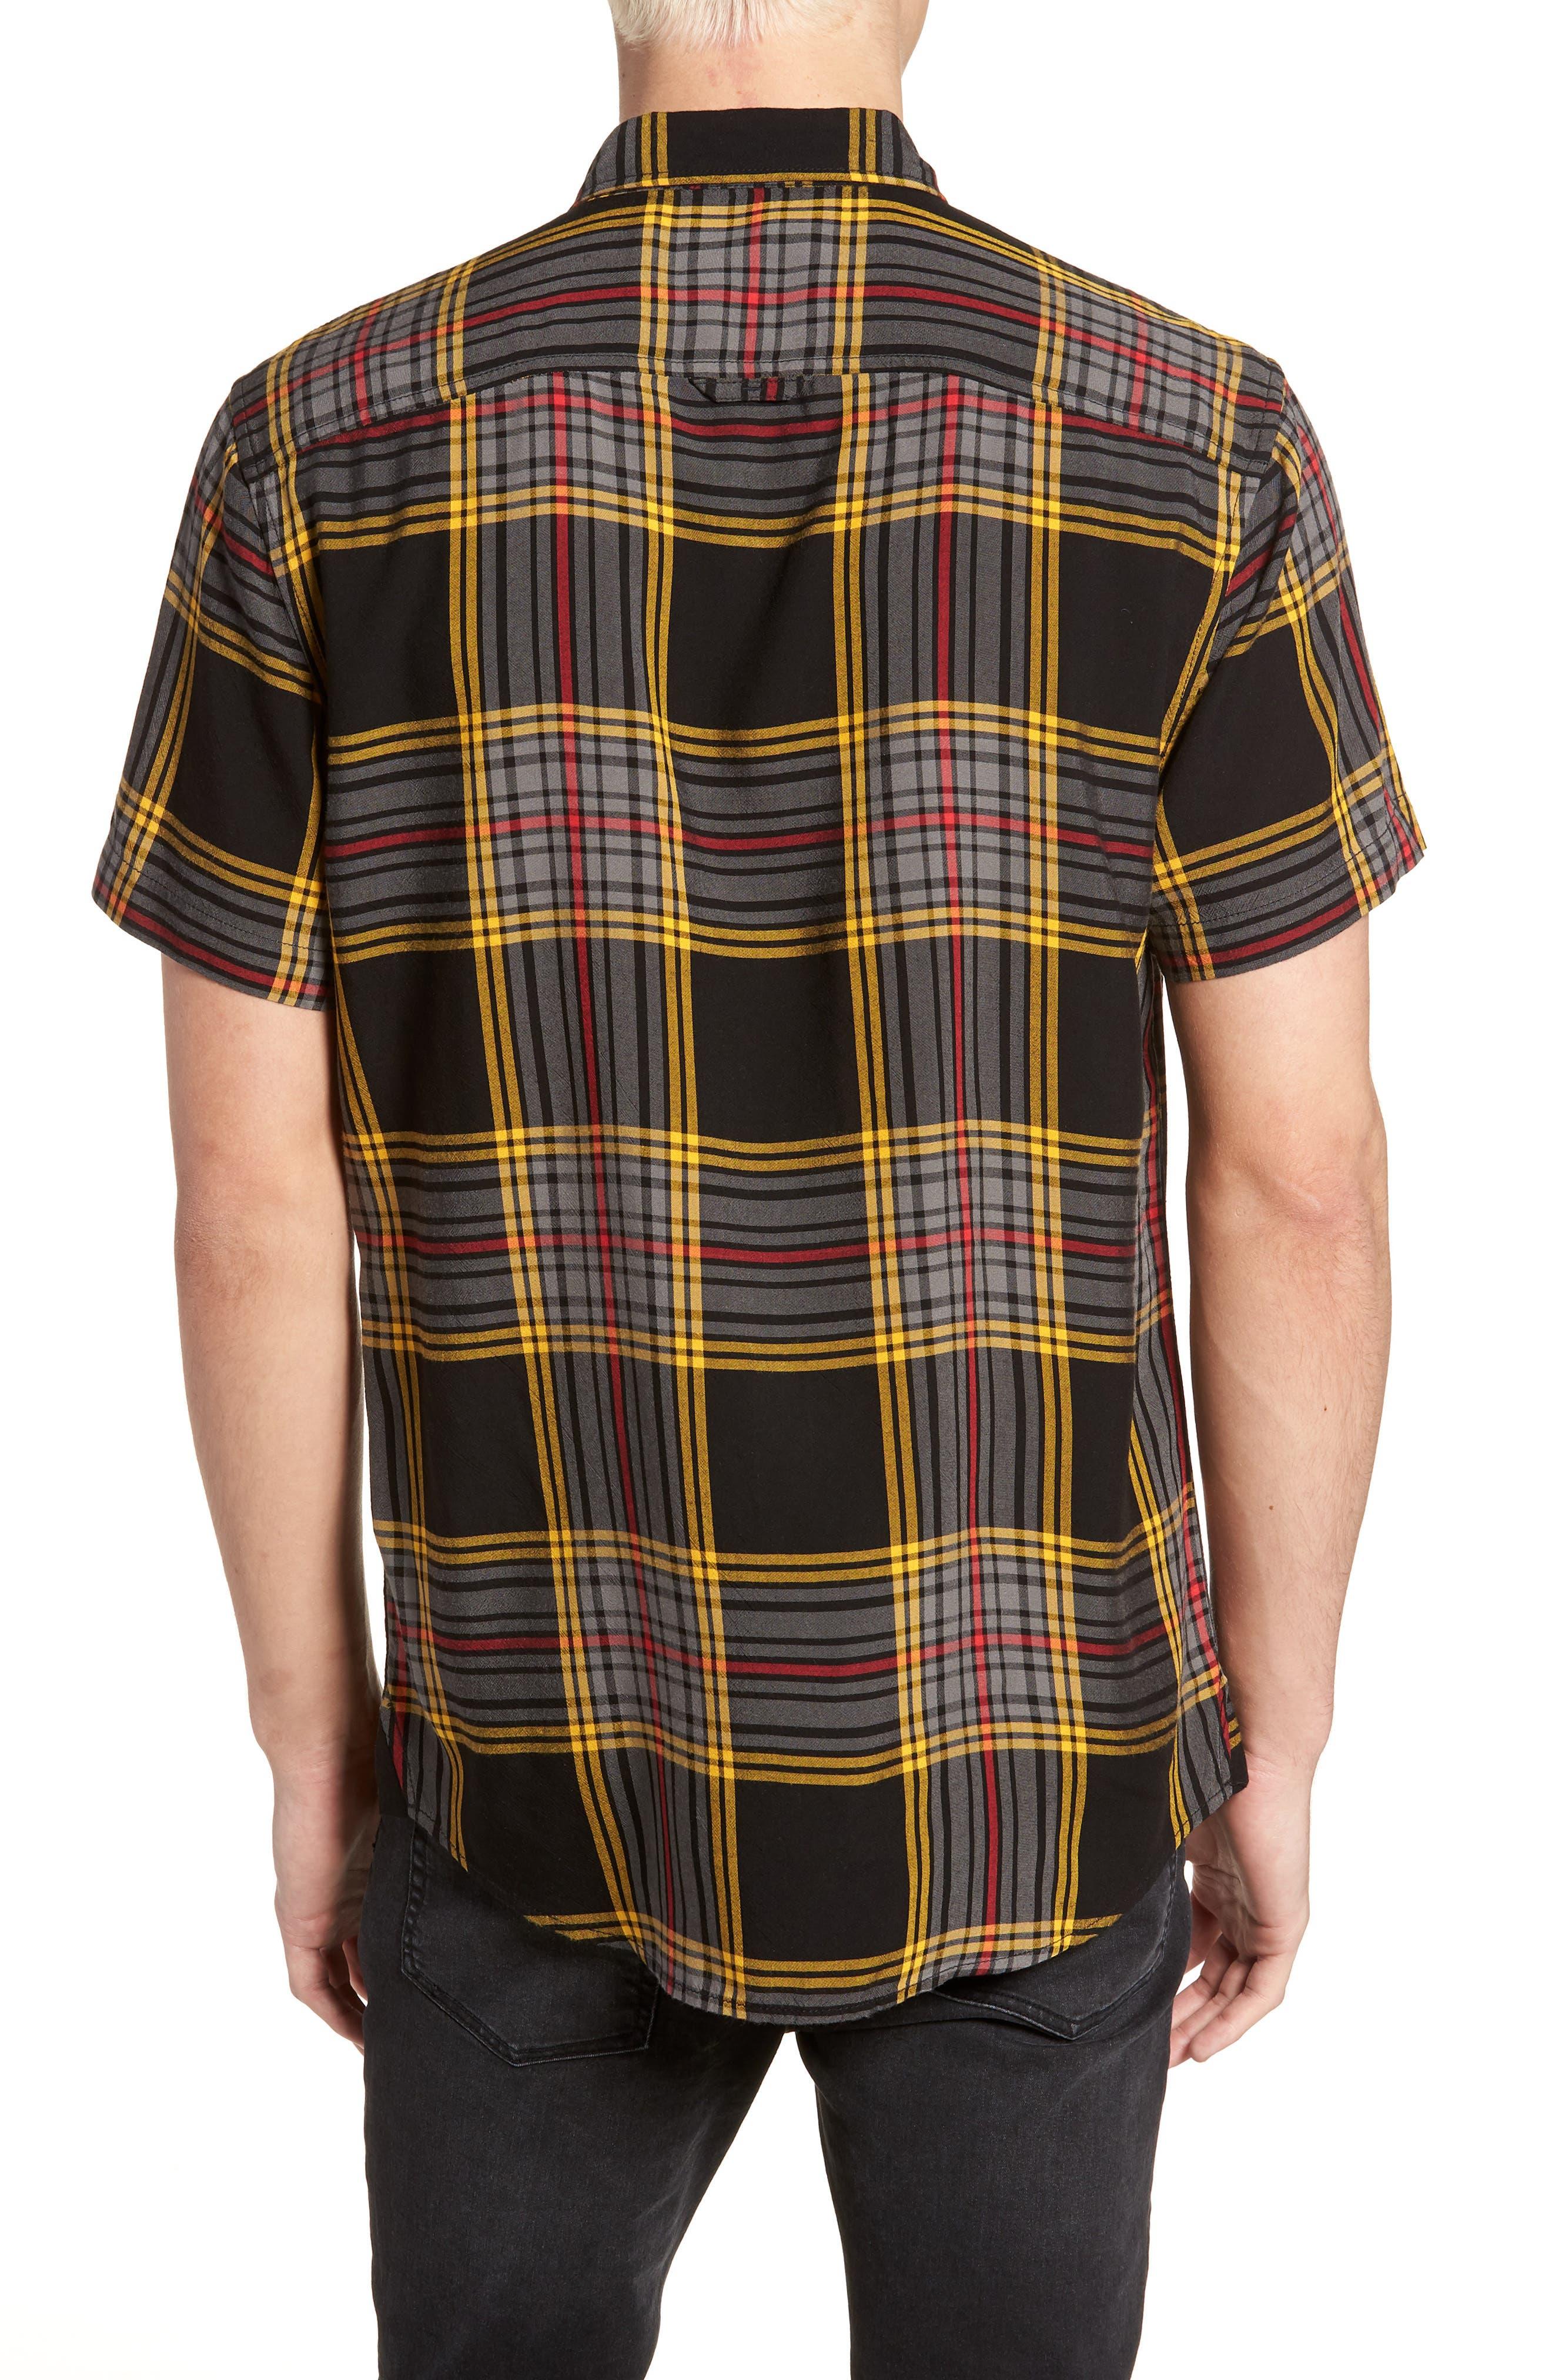 Yarn Dyed Plaid Shirt,                             Alternate thumbnail 3, color,                             Black Yellow Ethan Plaid